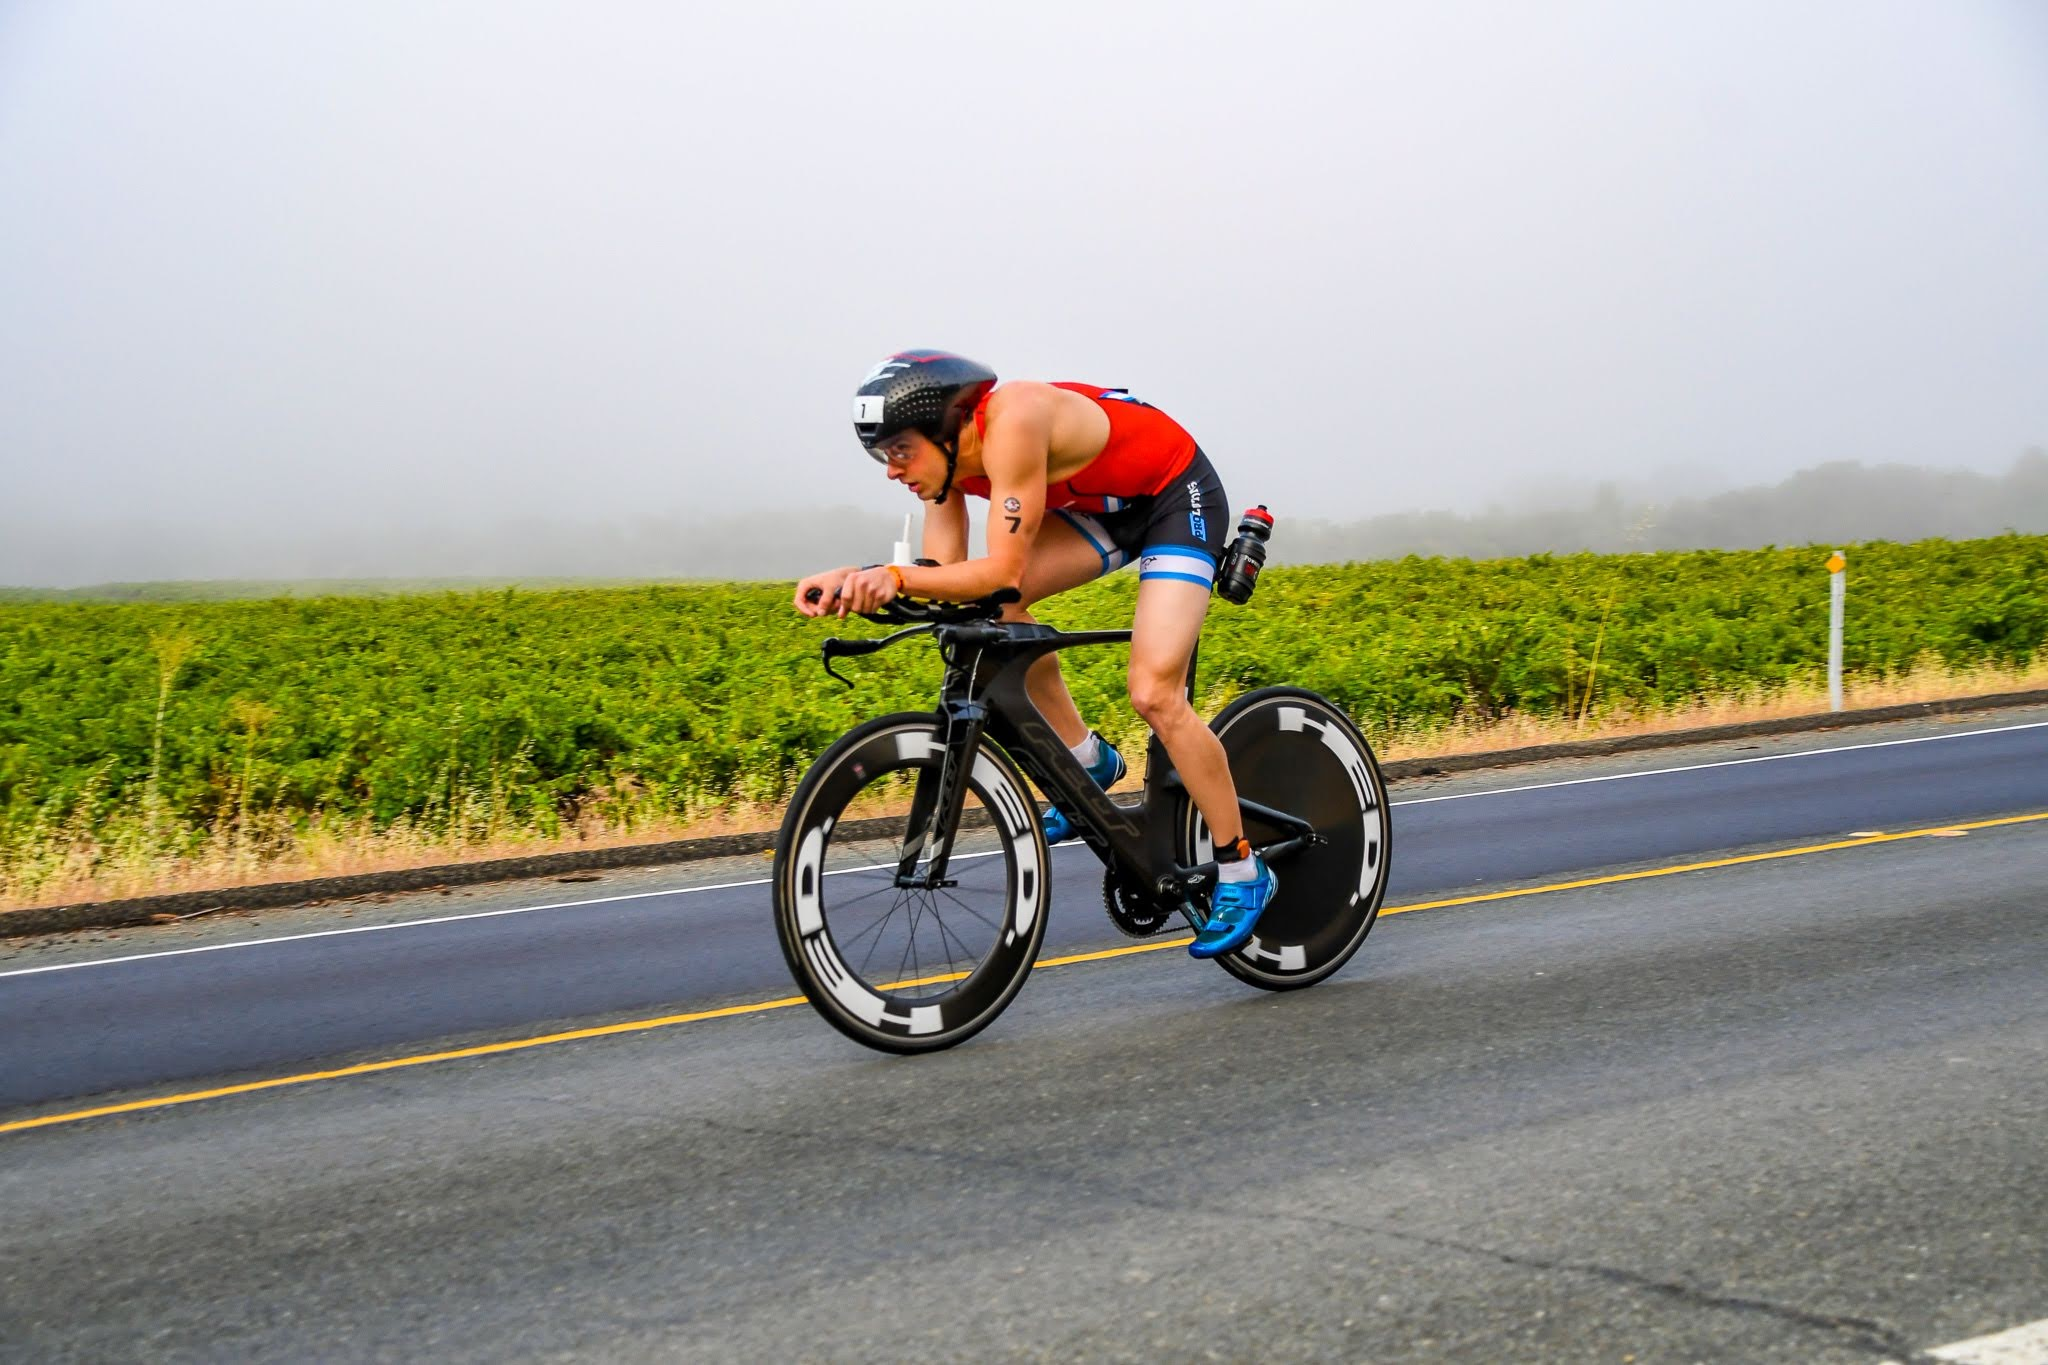 The bike course at Ironman 70.3 Santa Rosa. Photo by Paul Higgins